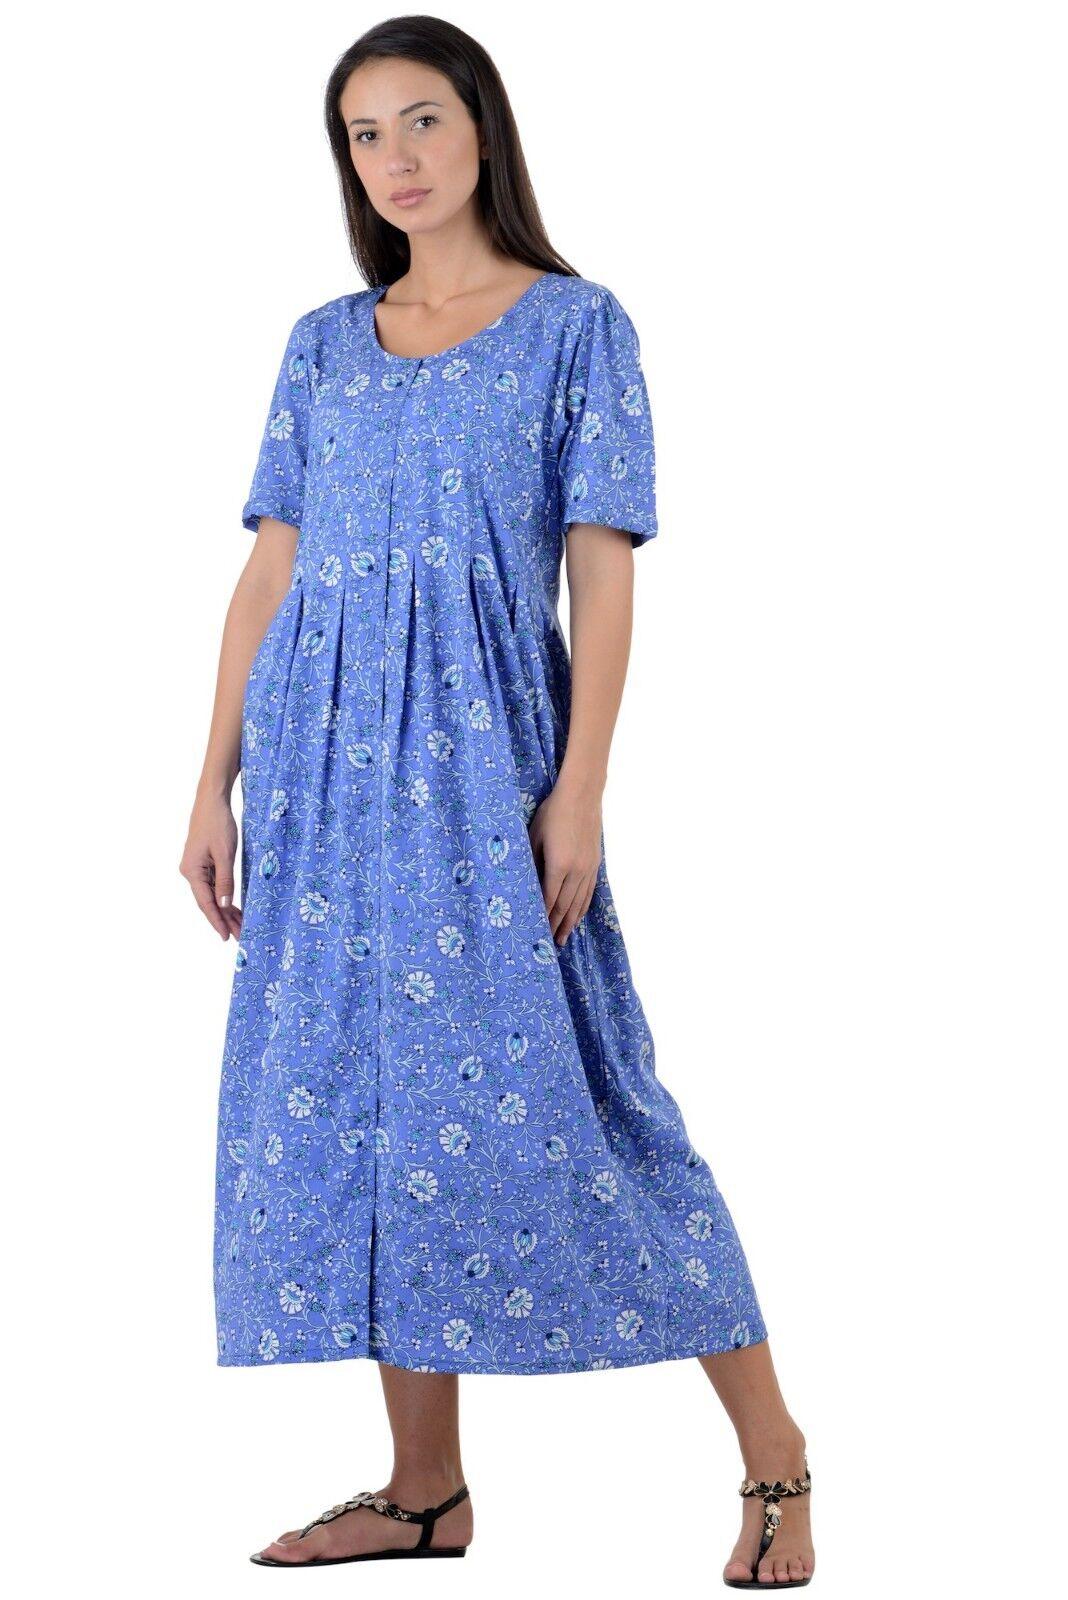 Cotton Lane Lane Lane Wrinkle-resistant Printed Dress D48blueE-PTD 5aff65